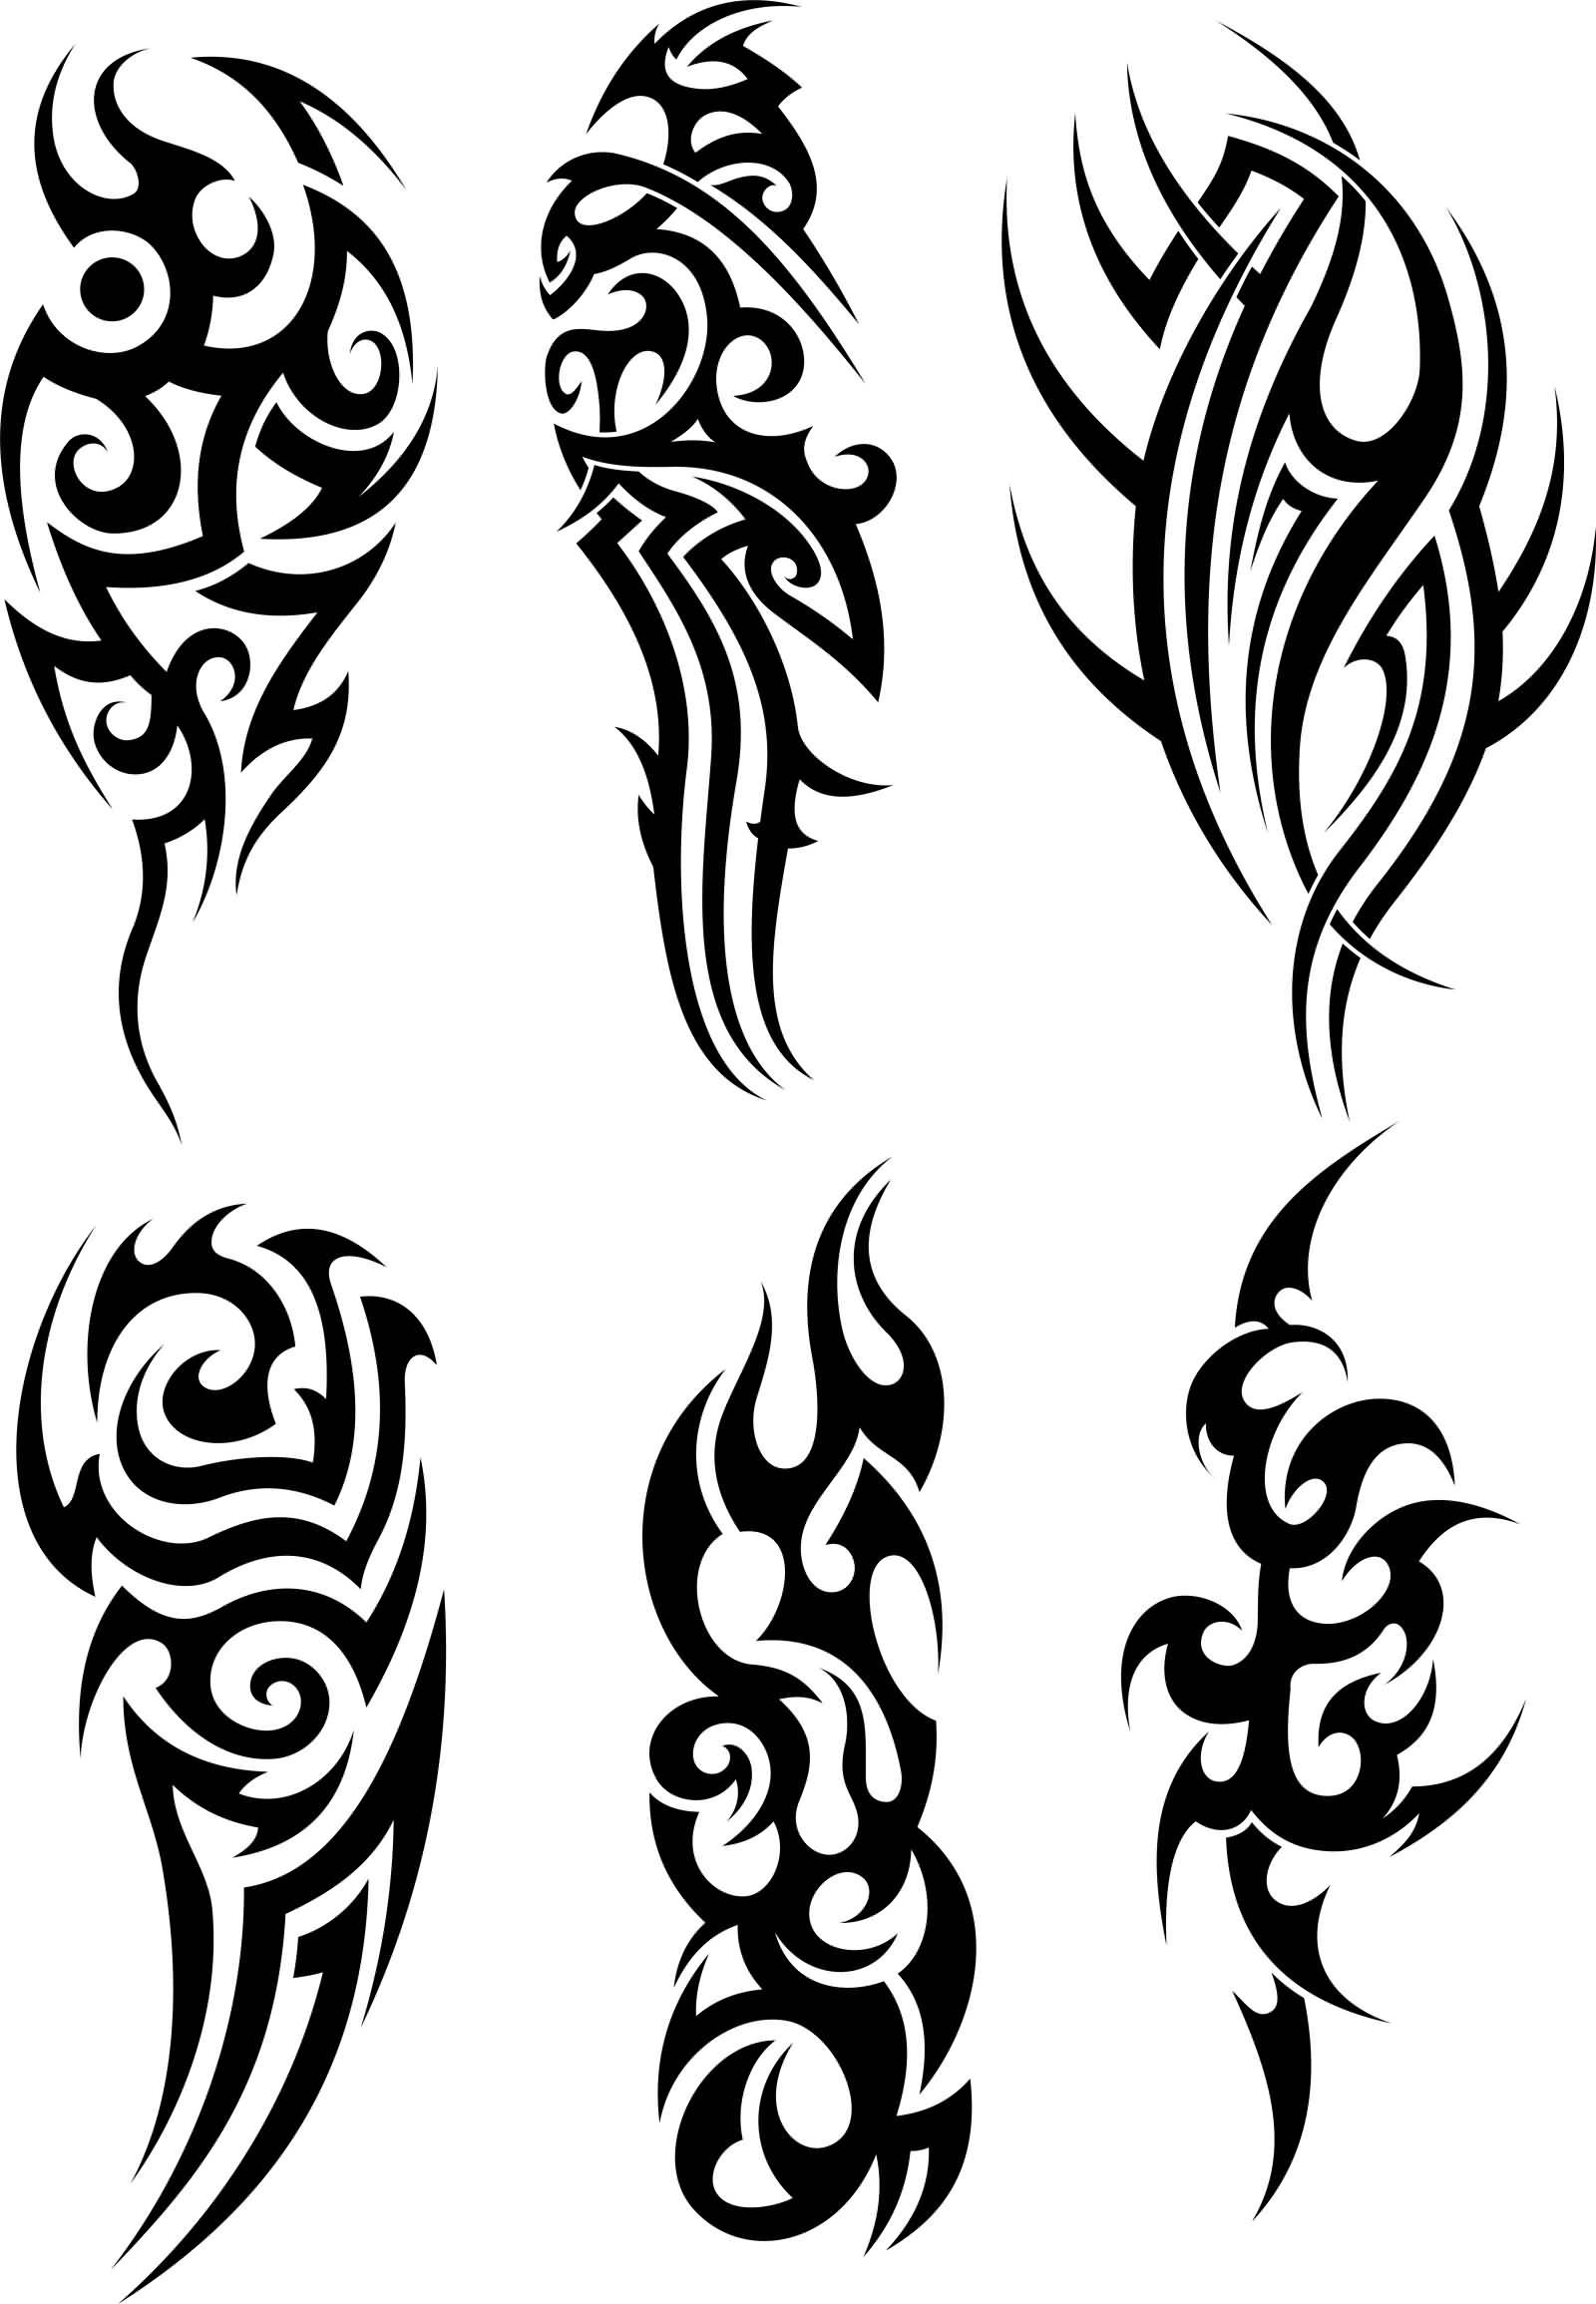 921defab8 Stylish Black Tribal Tattoos Samples